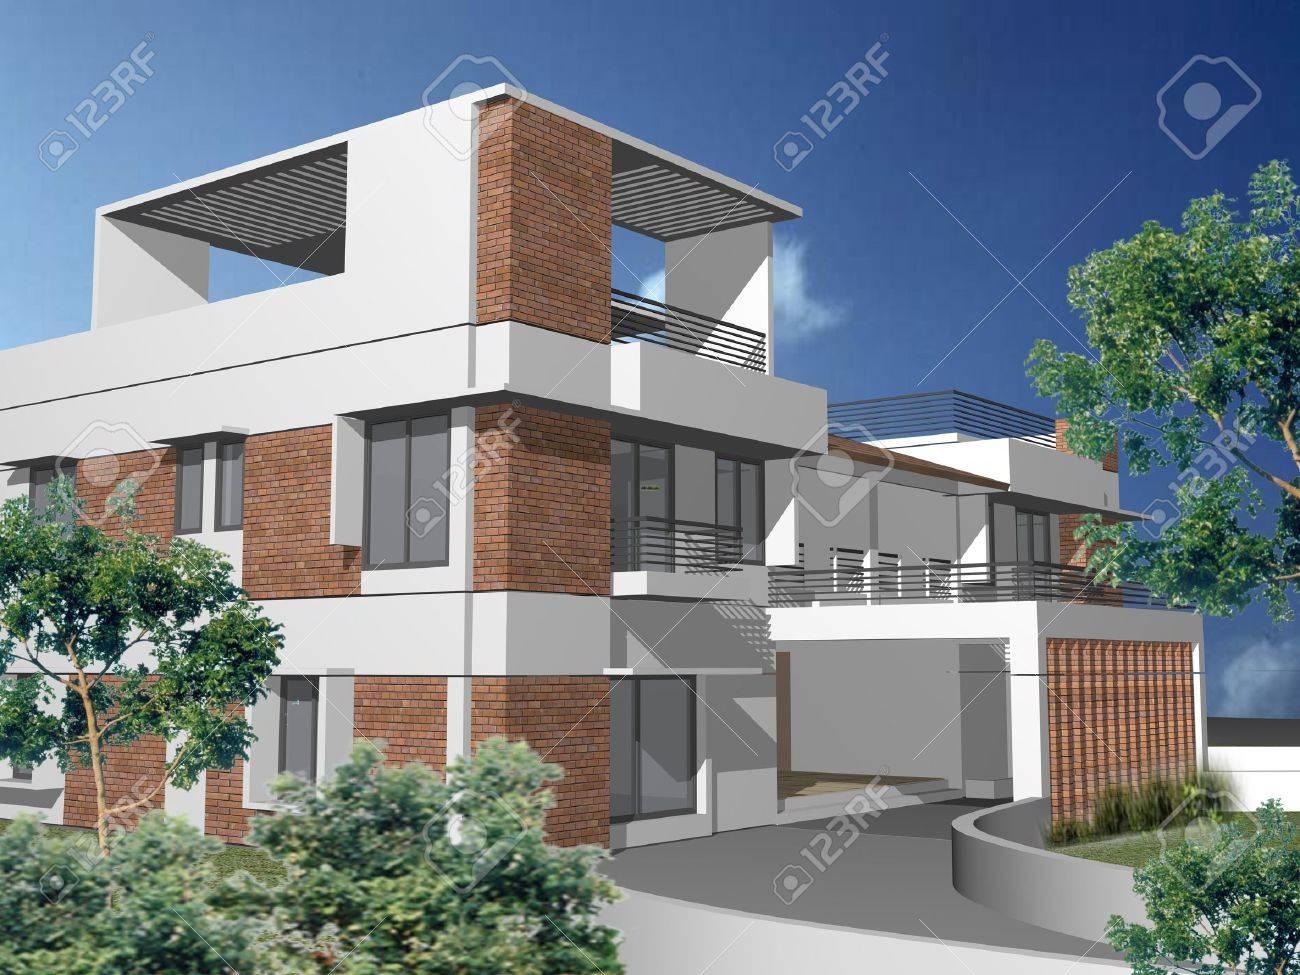 Modern 3d house Stock Photo - 12920826